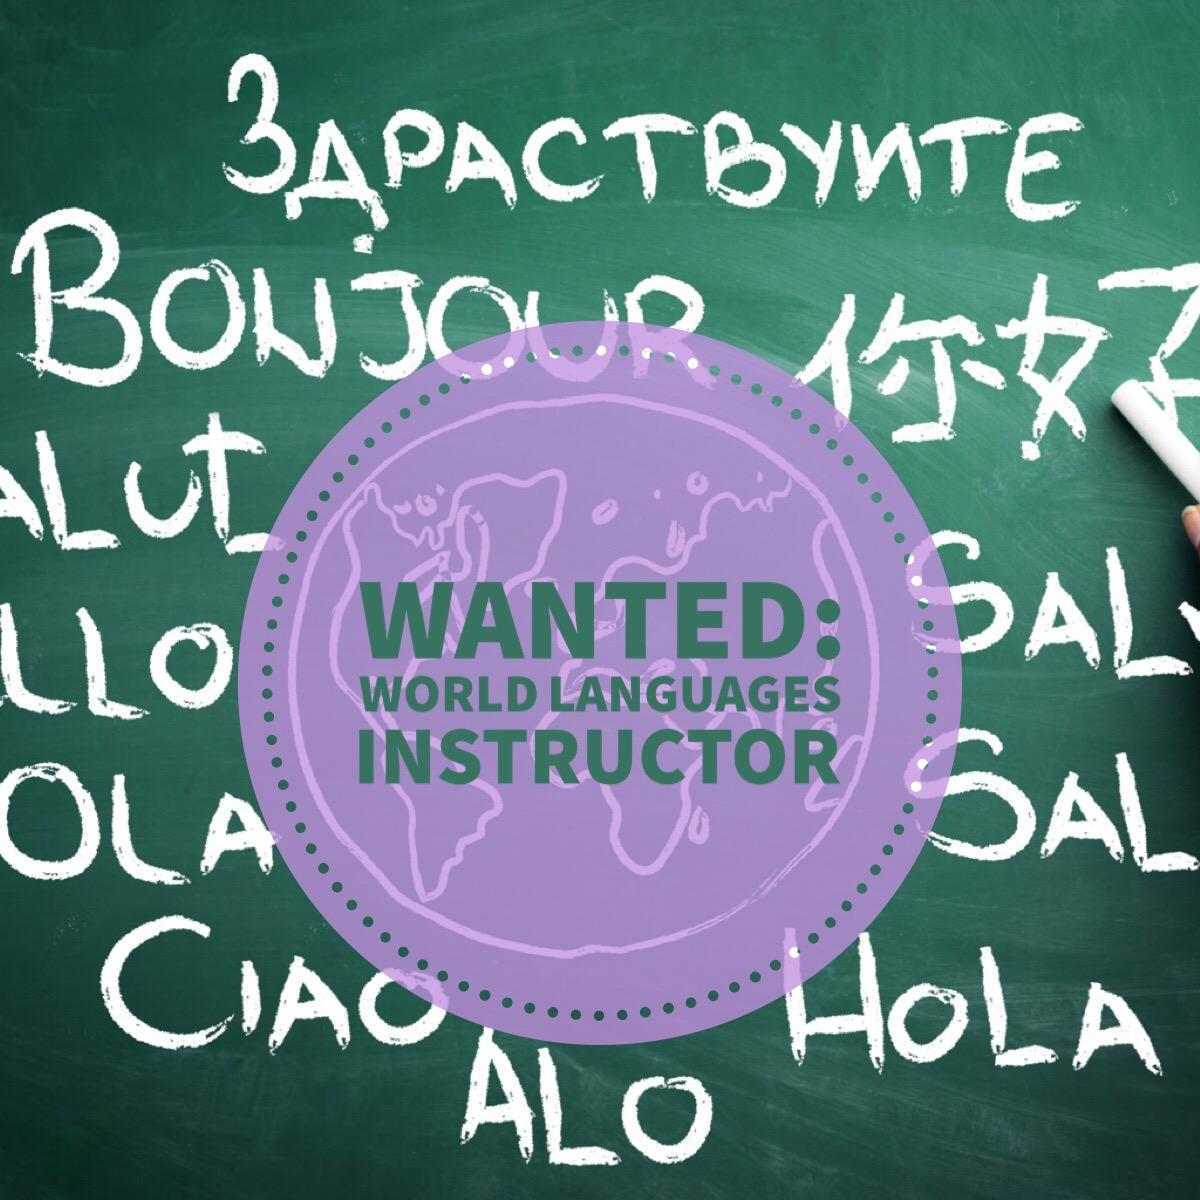 Eagle Rock School World Languages